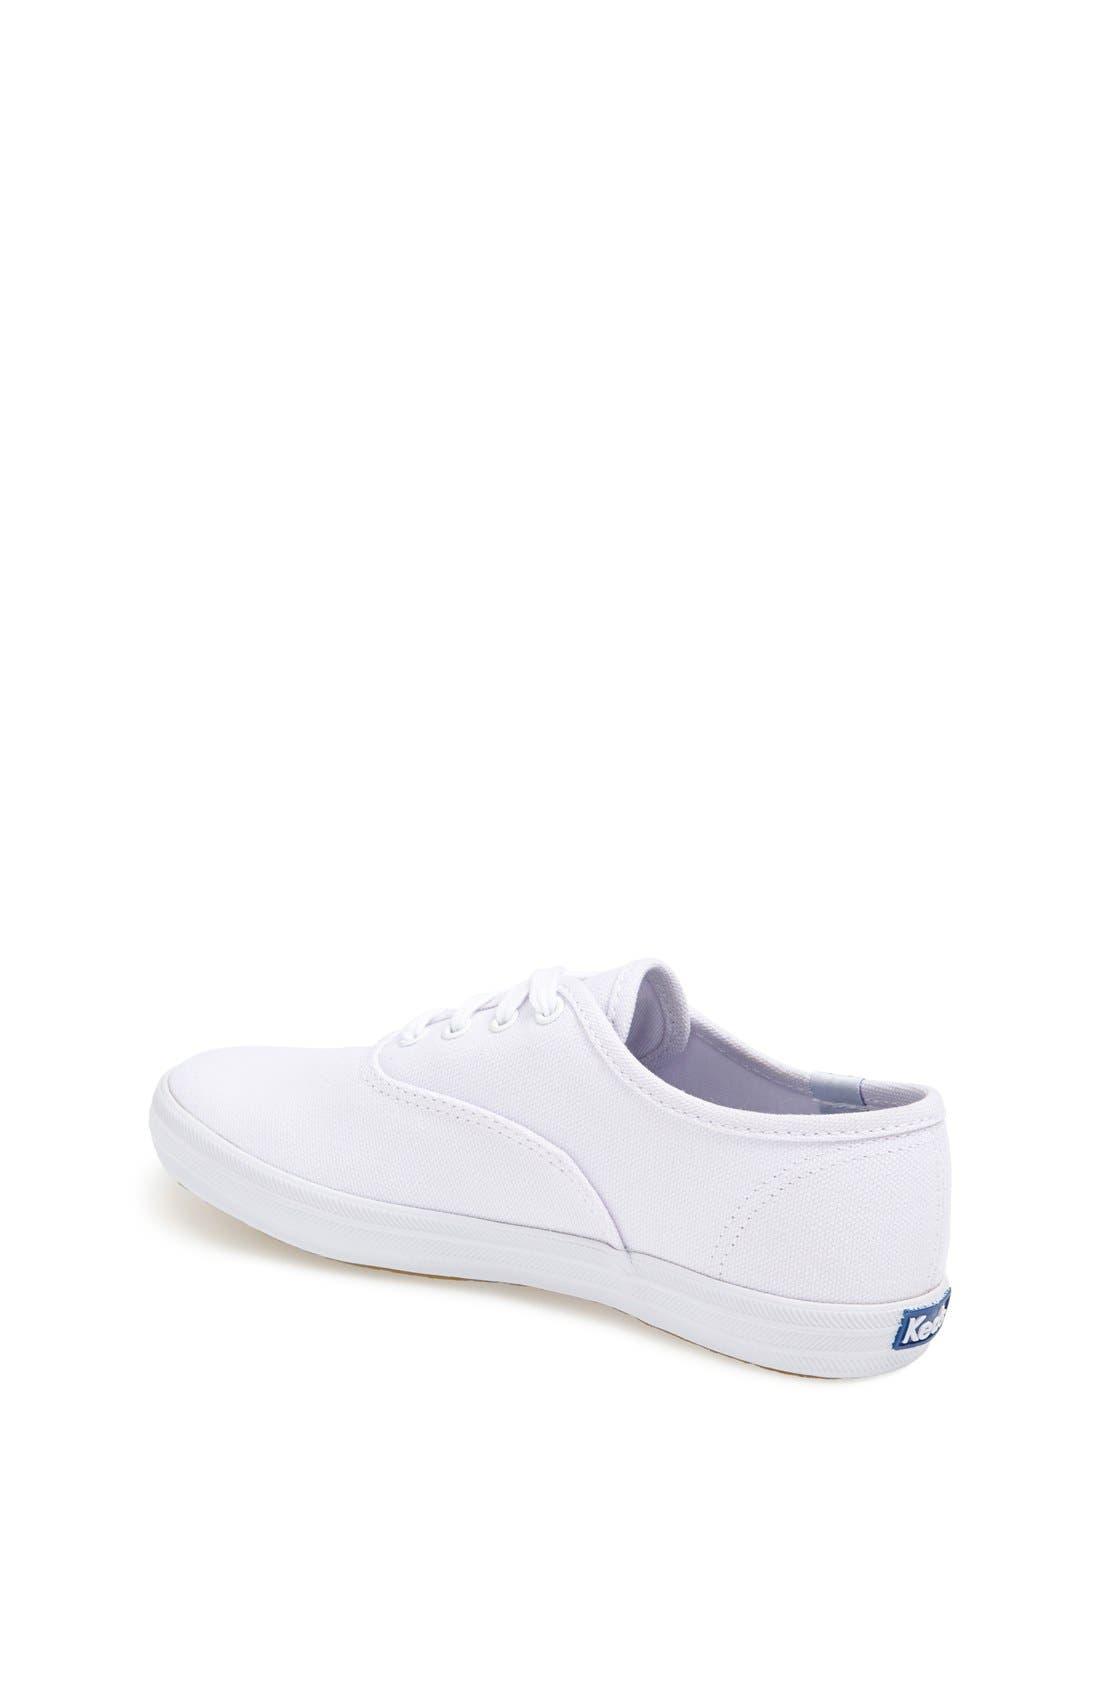 'Champion' Canvas Sneaker,                             Alternate thumbnail 6, color,                             NEW WHITE